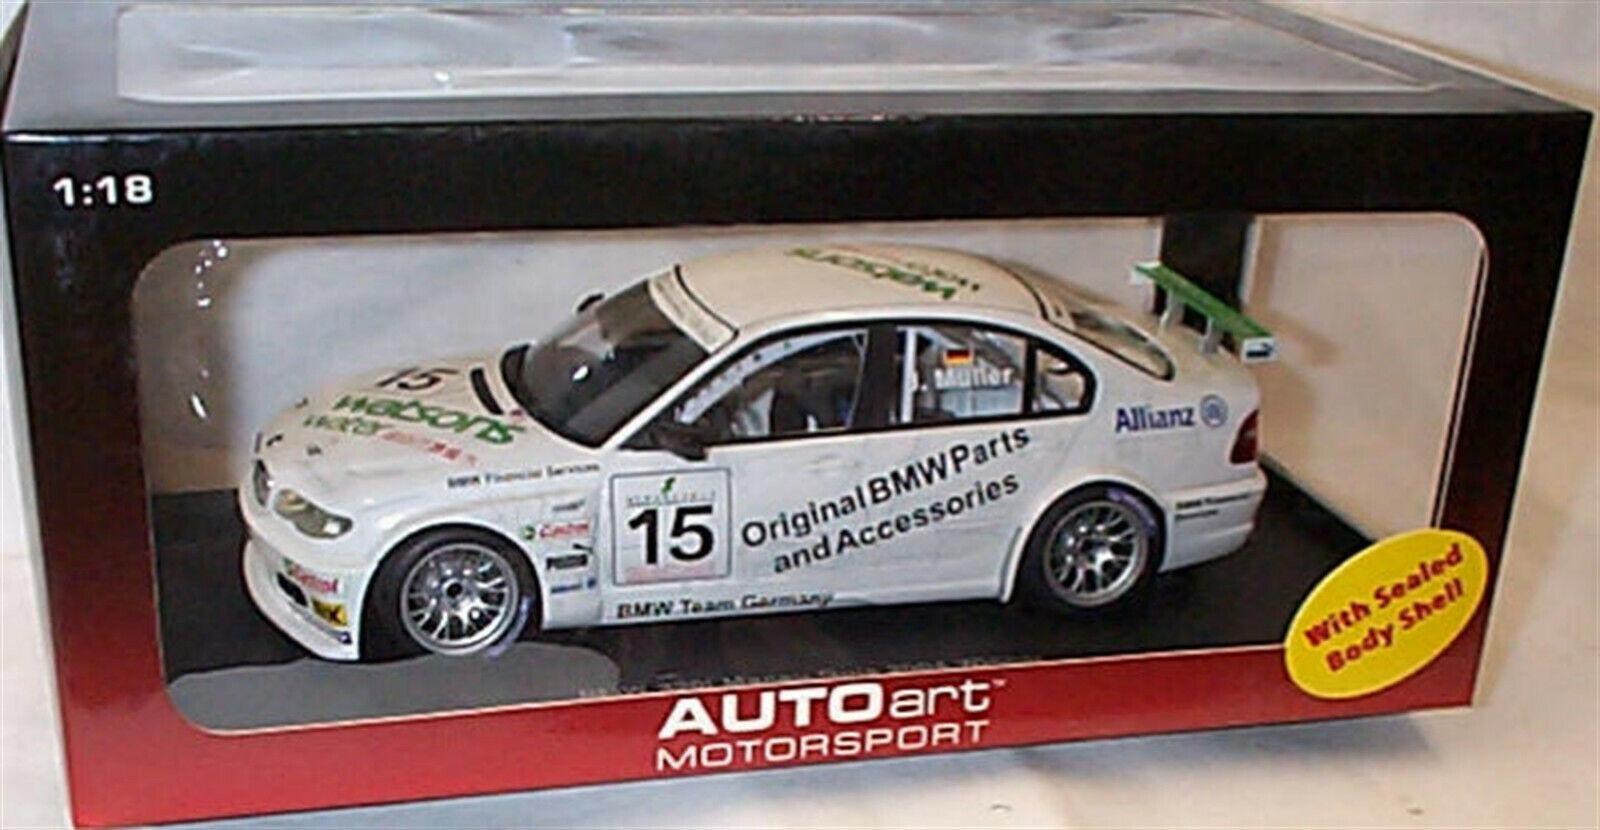 BMW 320i Macao Guia 2004 ganador J Muller Autoart 80449 Nuevo En Caja Escala 1-18